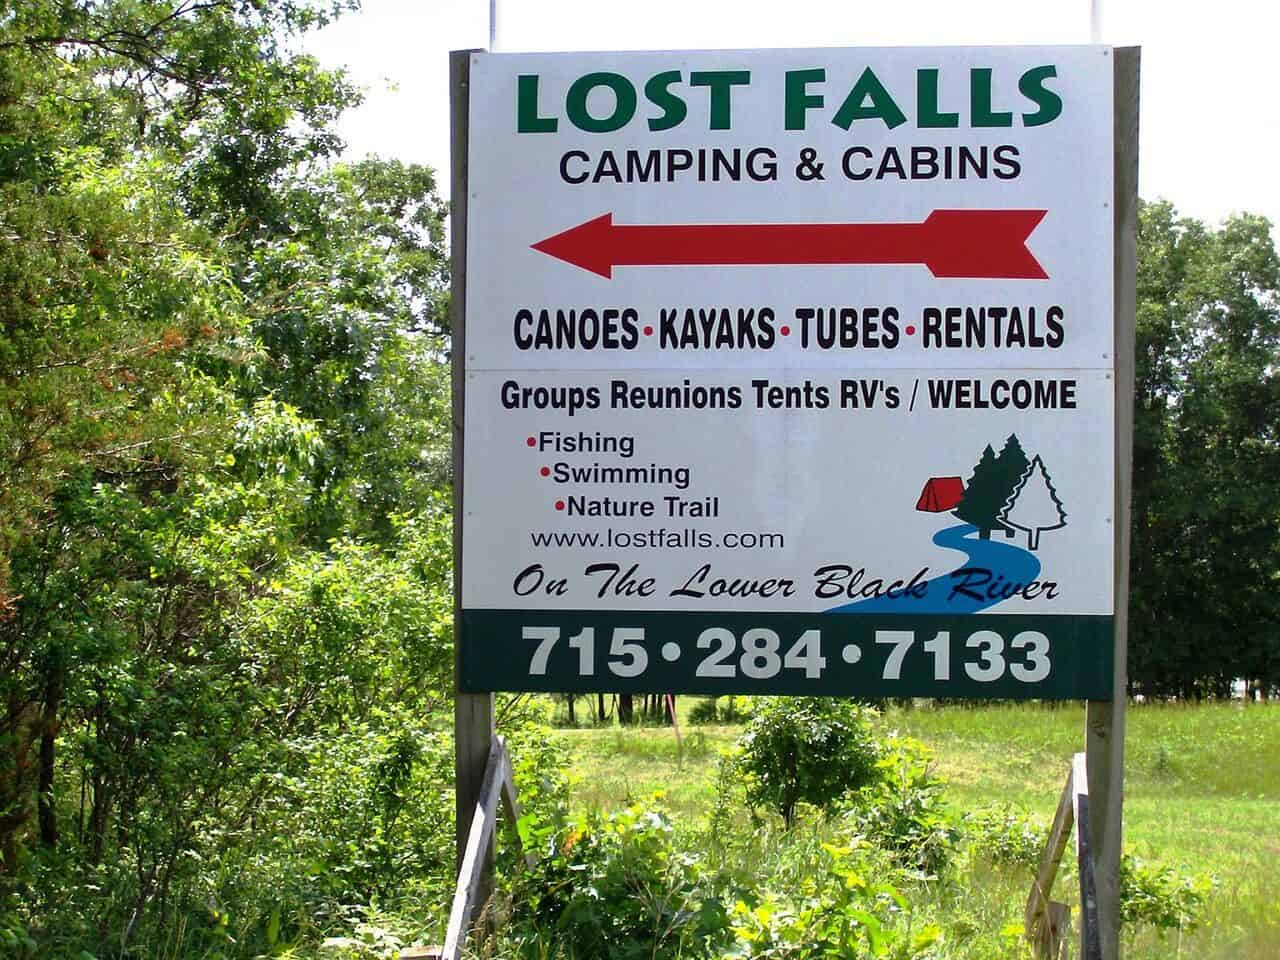 Phrase black river falls nudist camp agree very